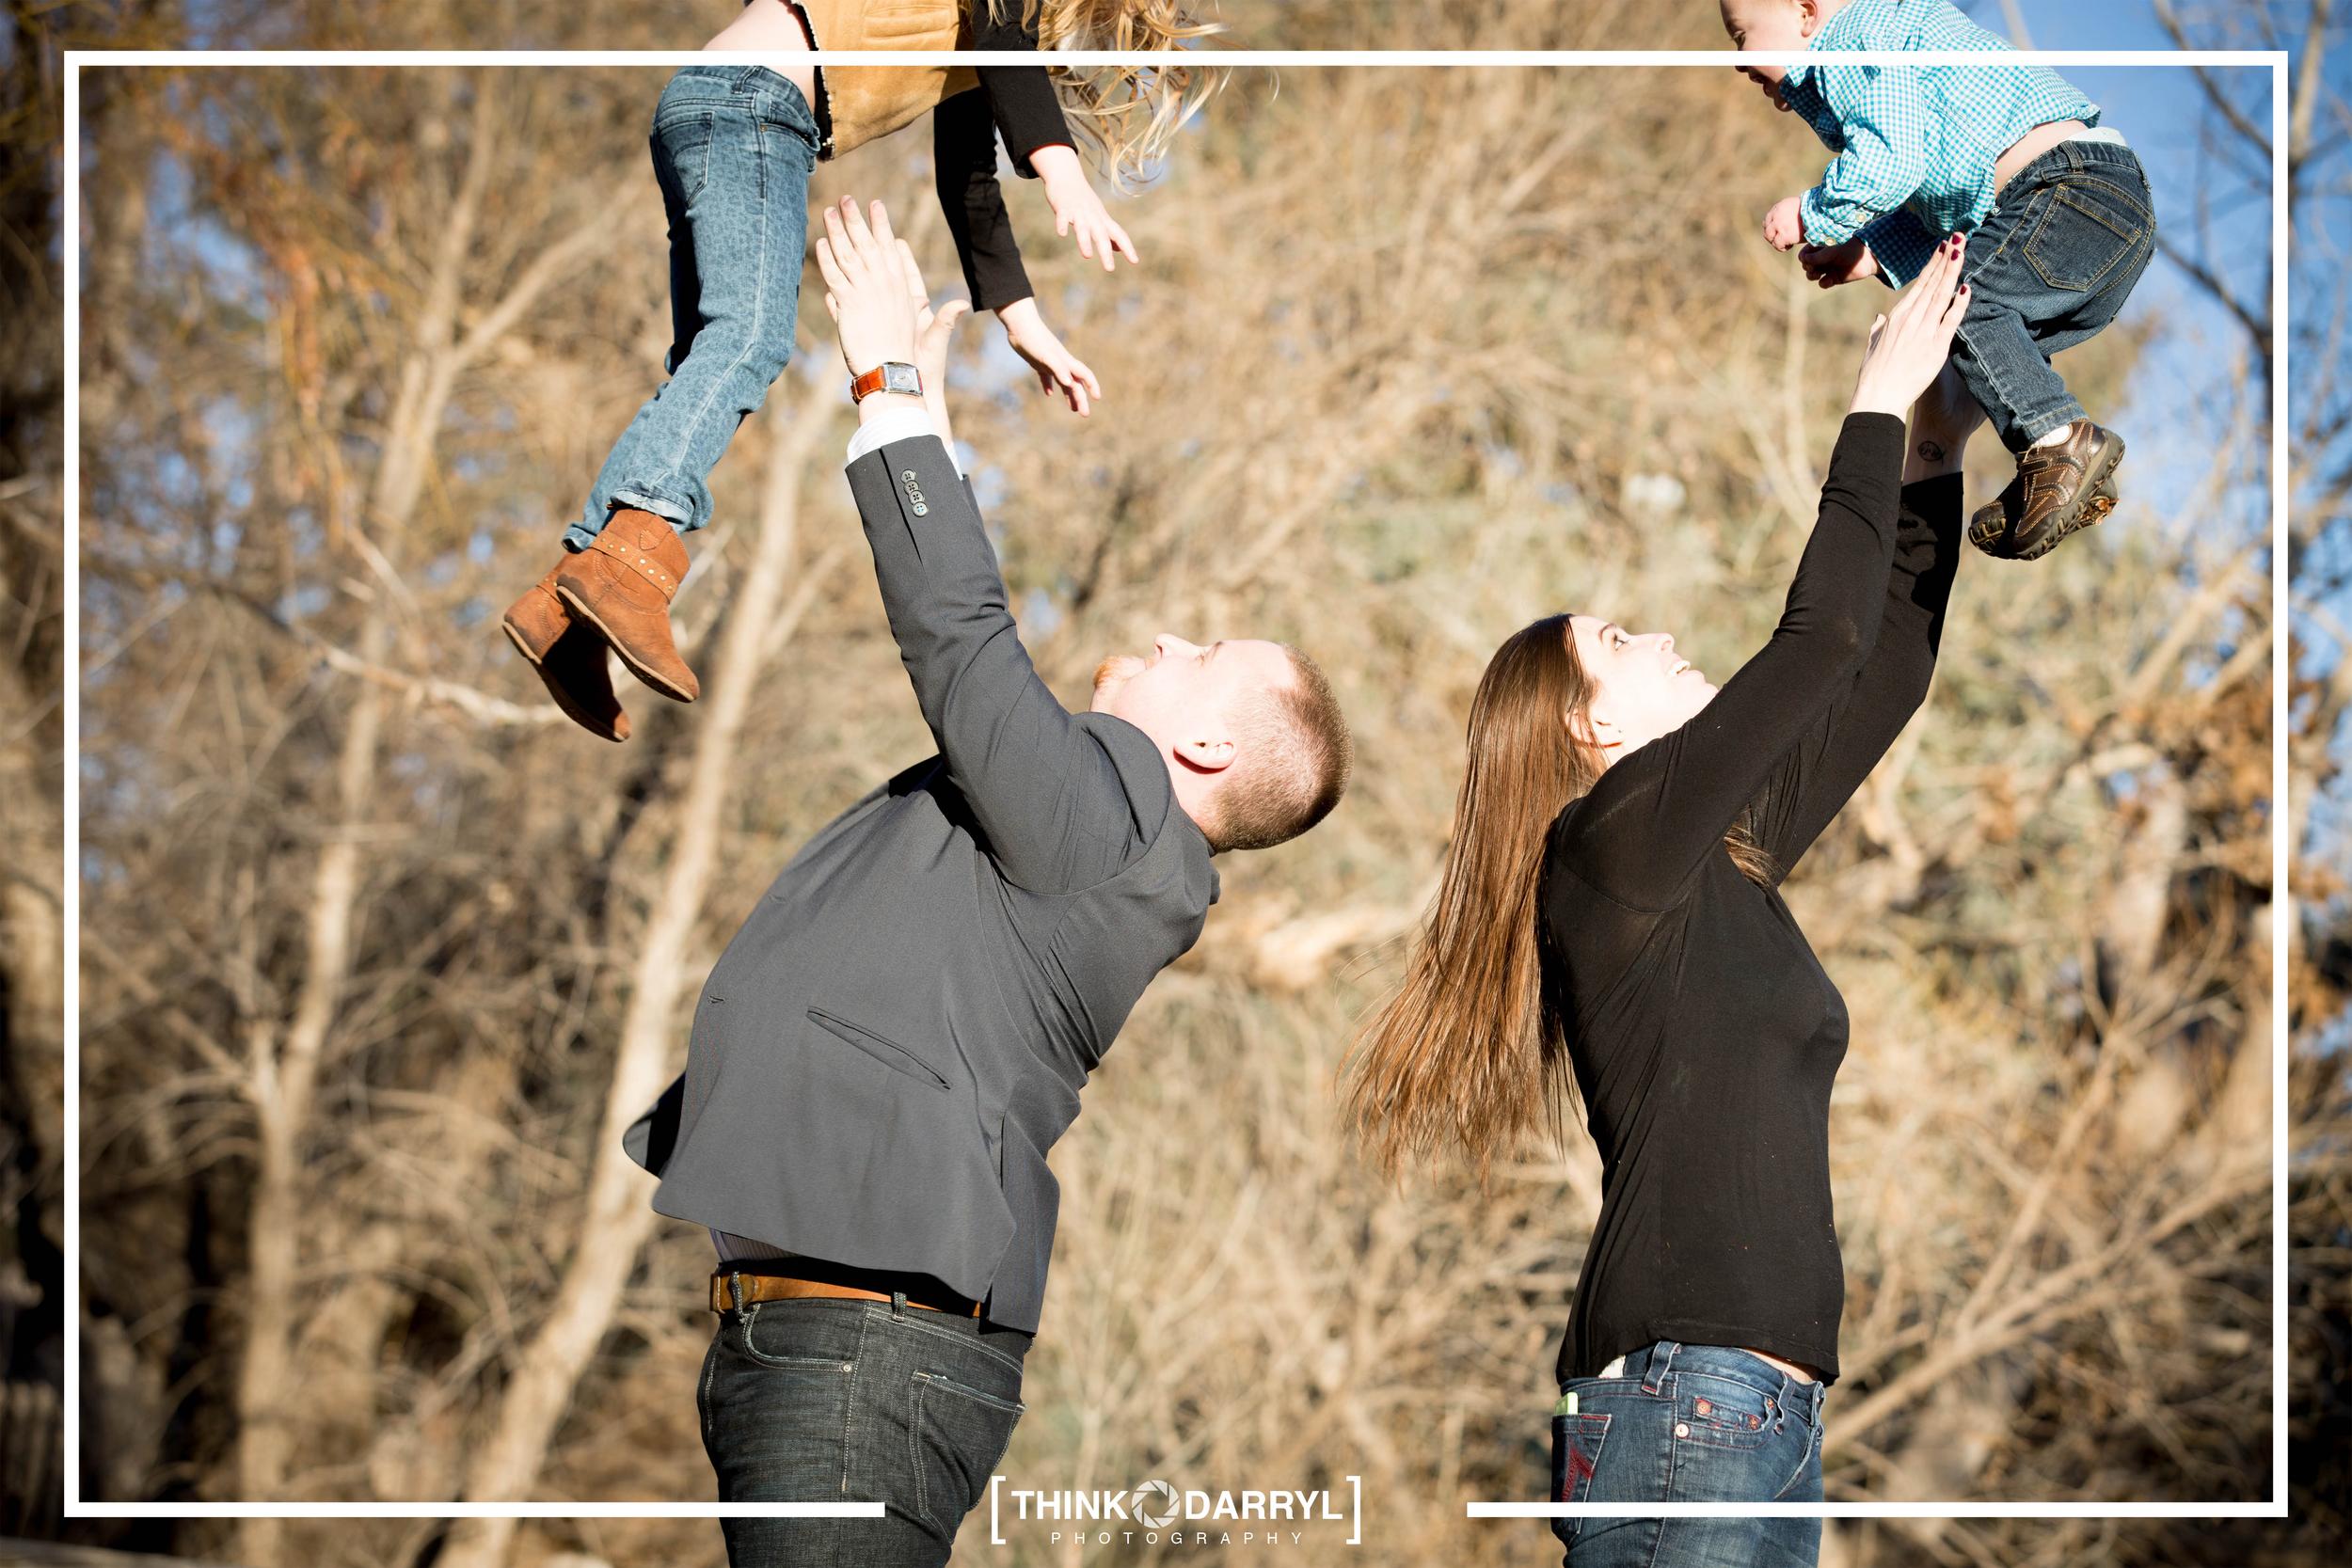 Conley Family | Think Darryl Photography - Denver FamilyPhotographer